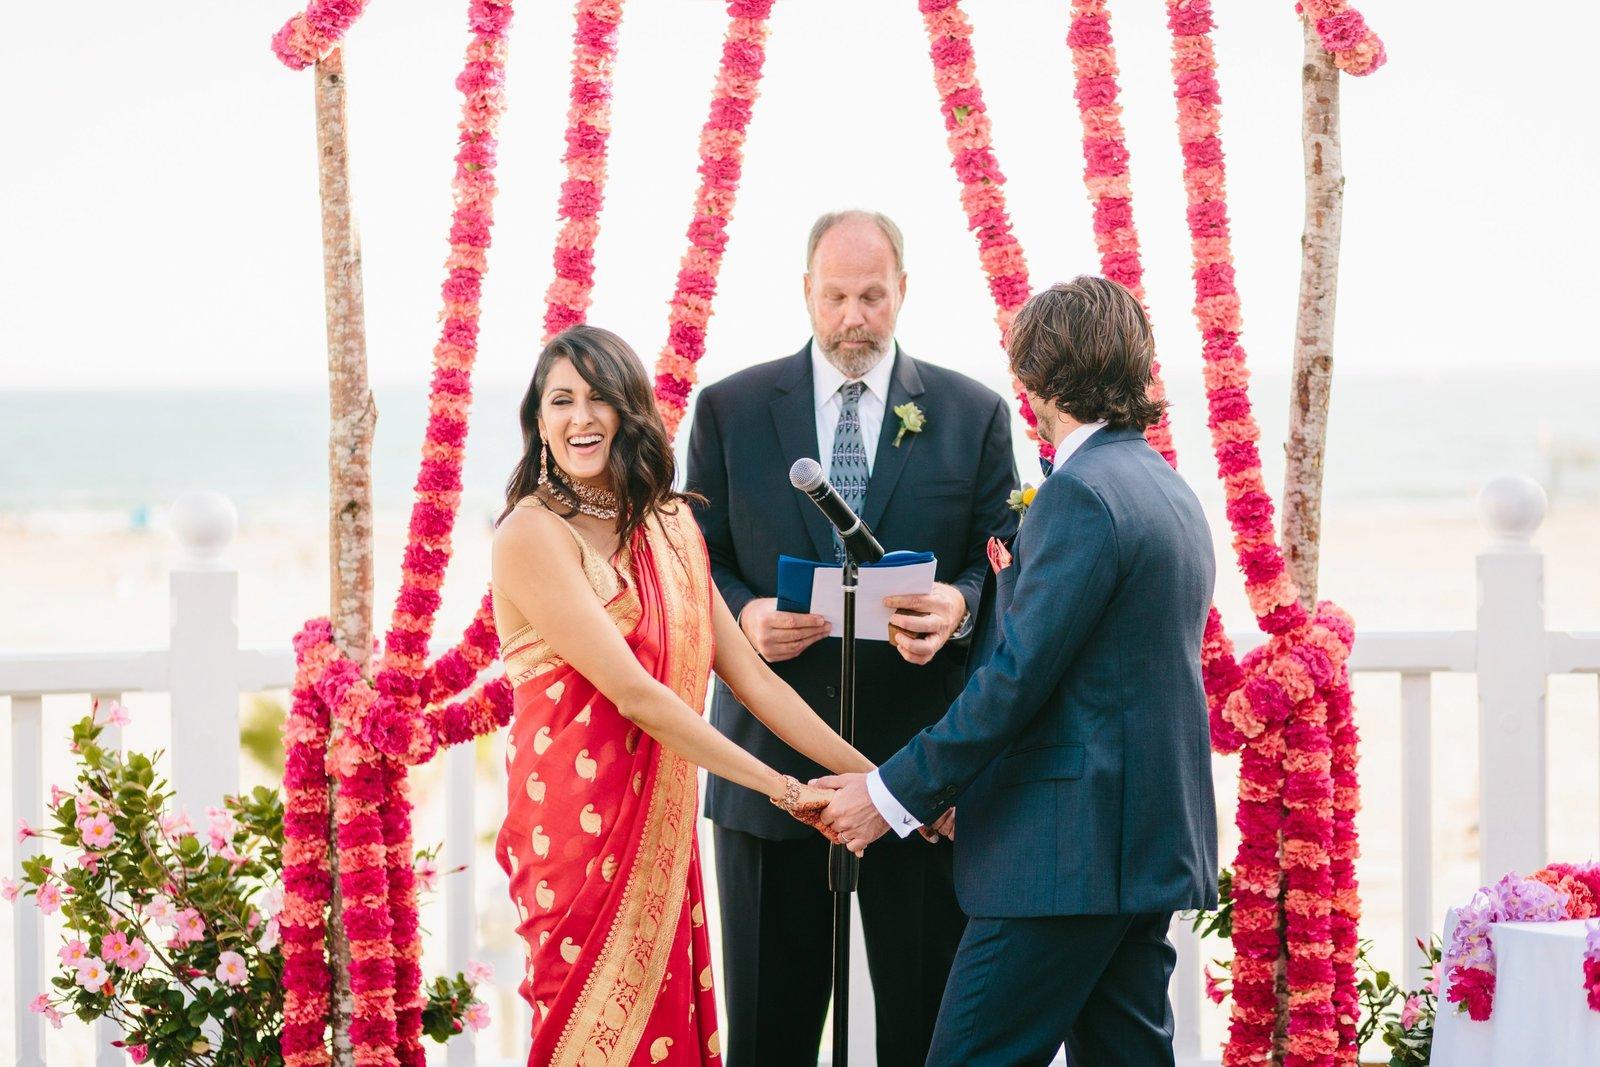 Wedding Photos-Jodee Debes Photography-281